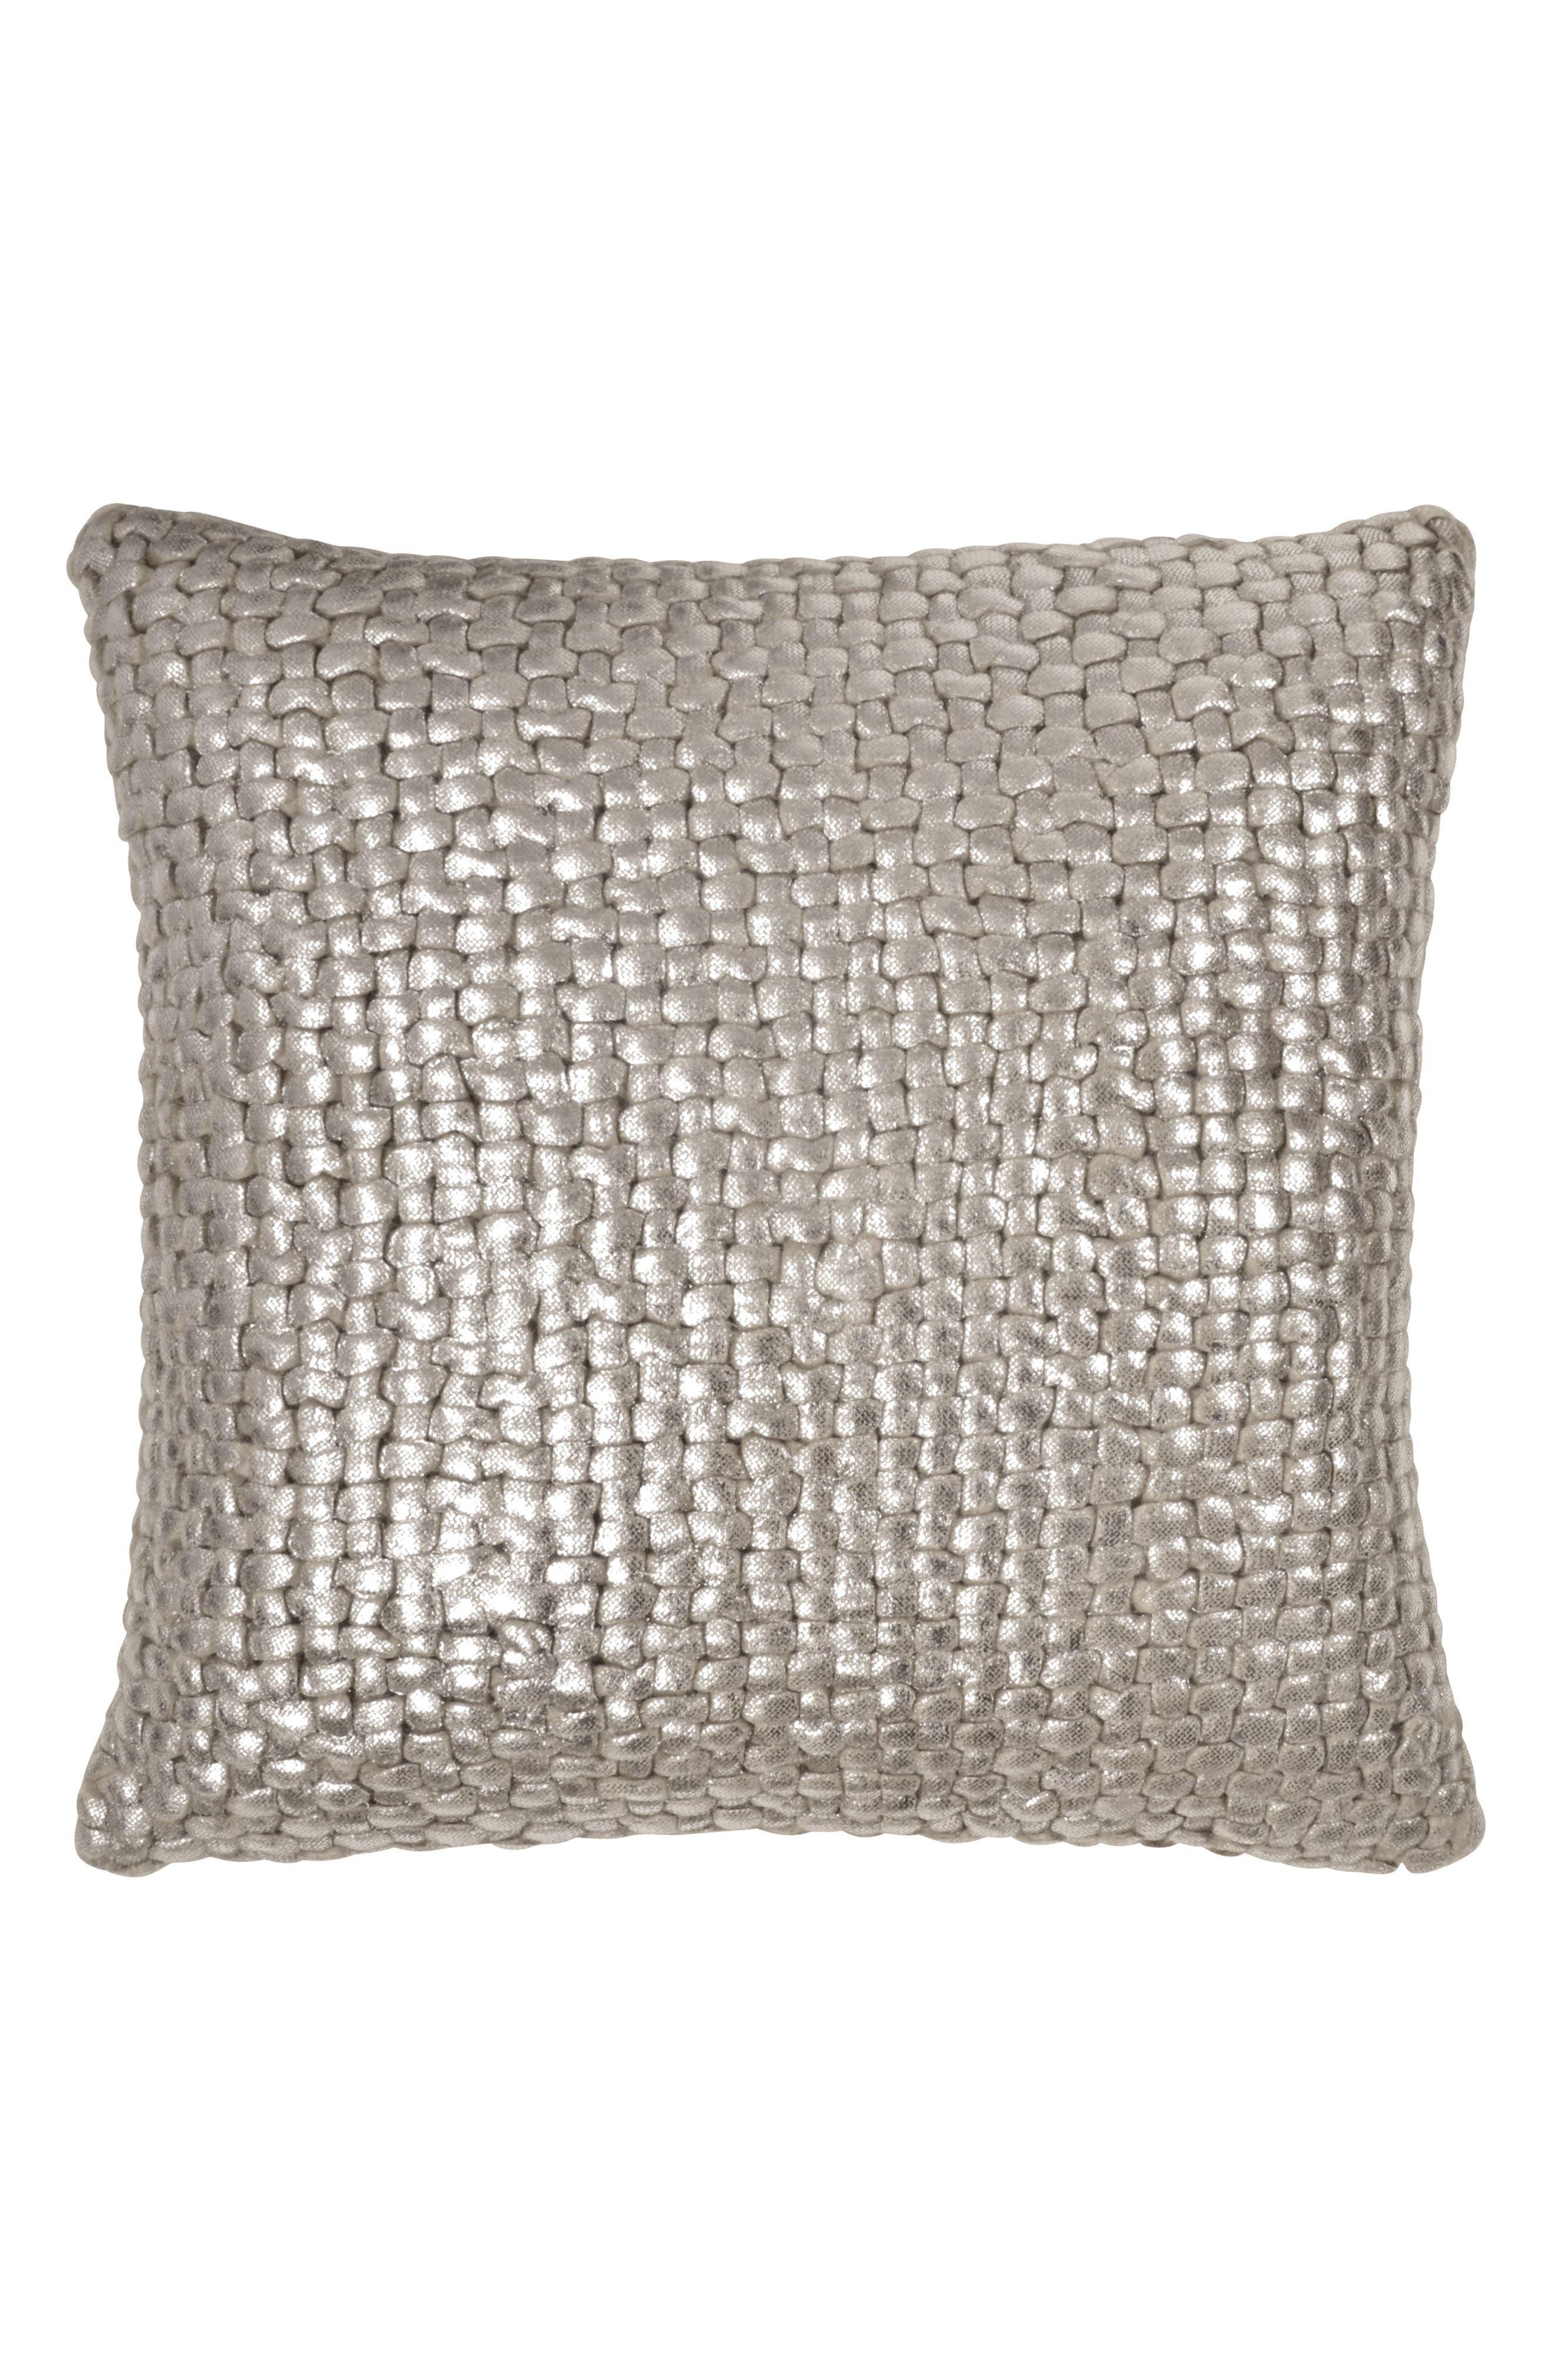 Alternate Image 1 Selected - Michael Aram Metallic Basket Weave Accent Pillow